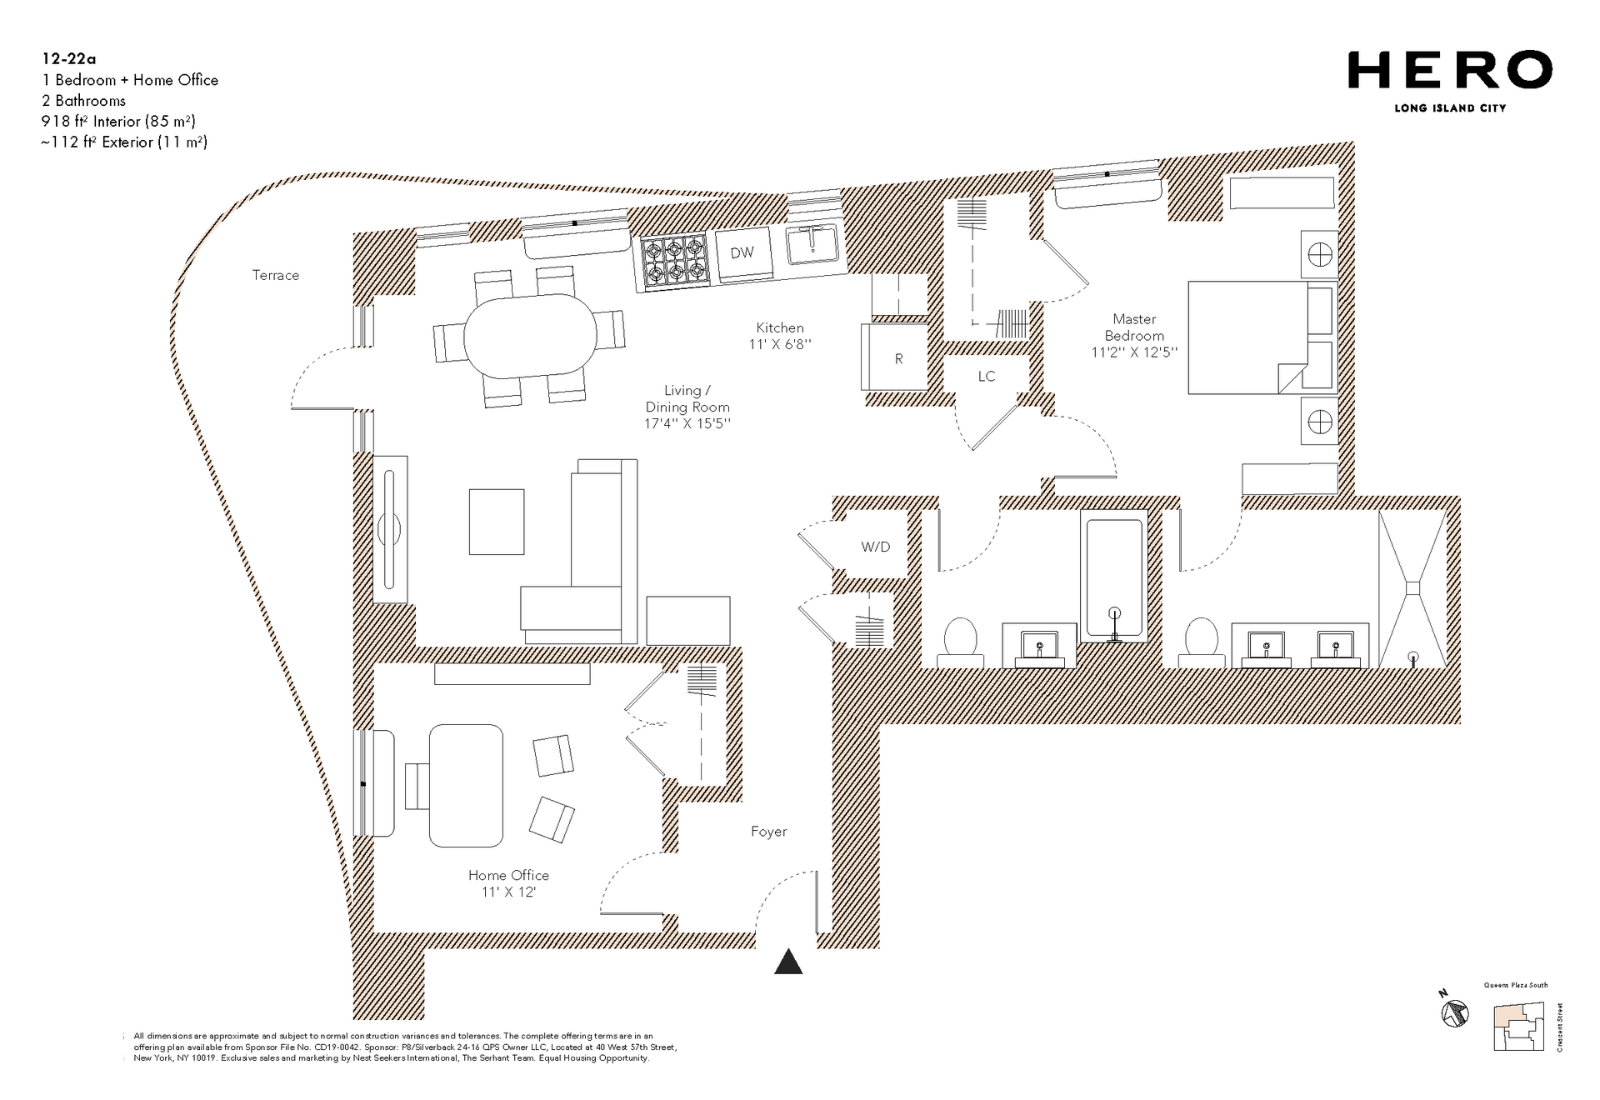 A Line: 一房一厅加一个家庭办公室,可以当作两房来使用,还有私人阳台